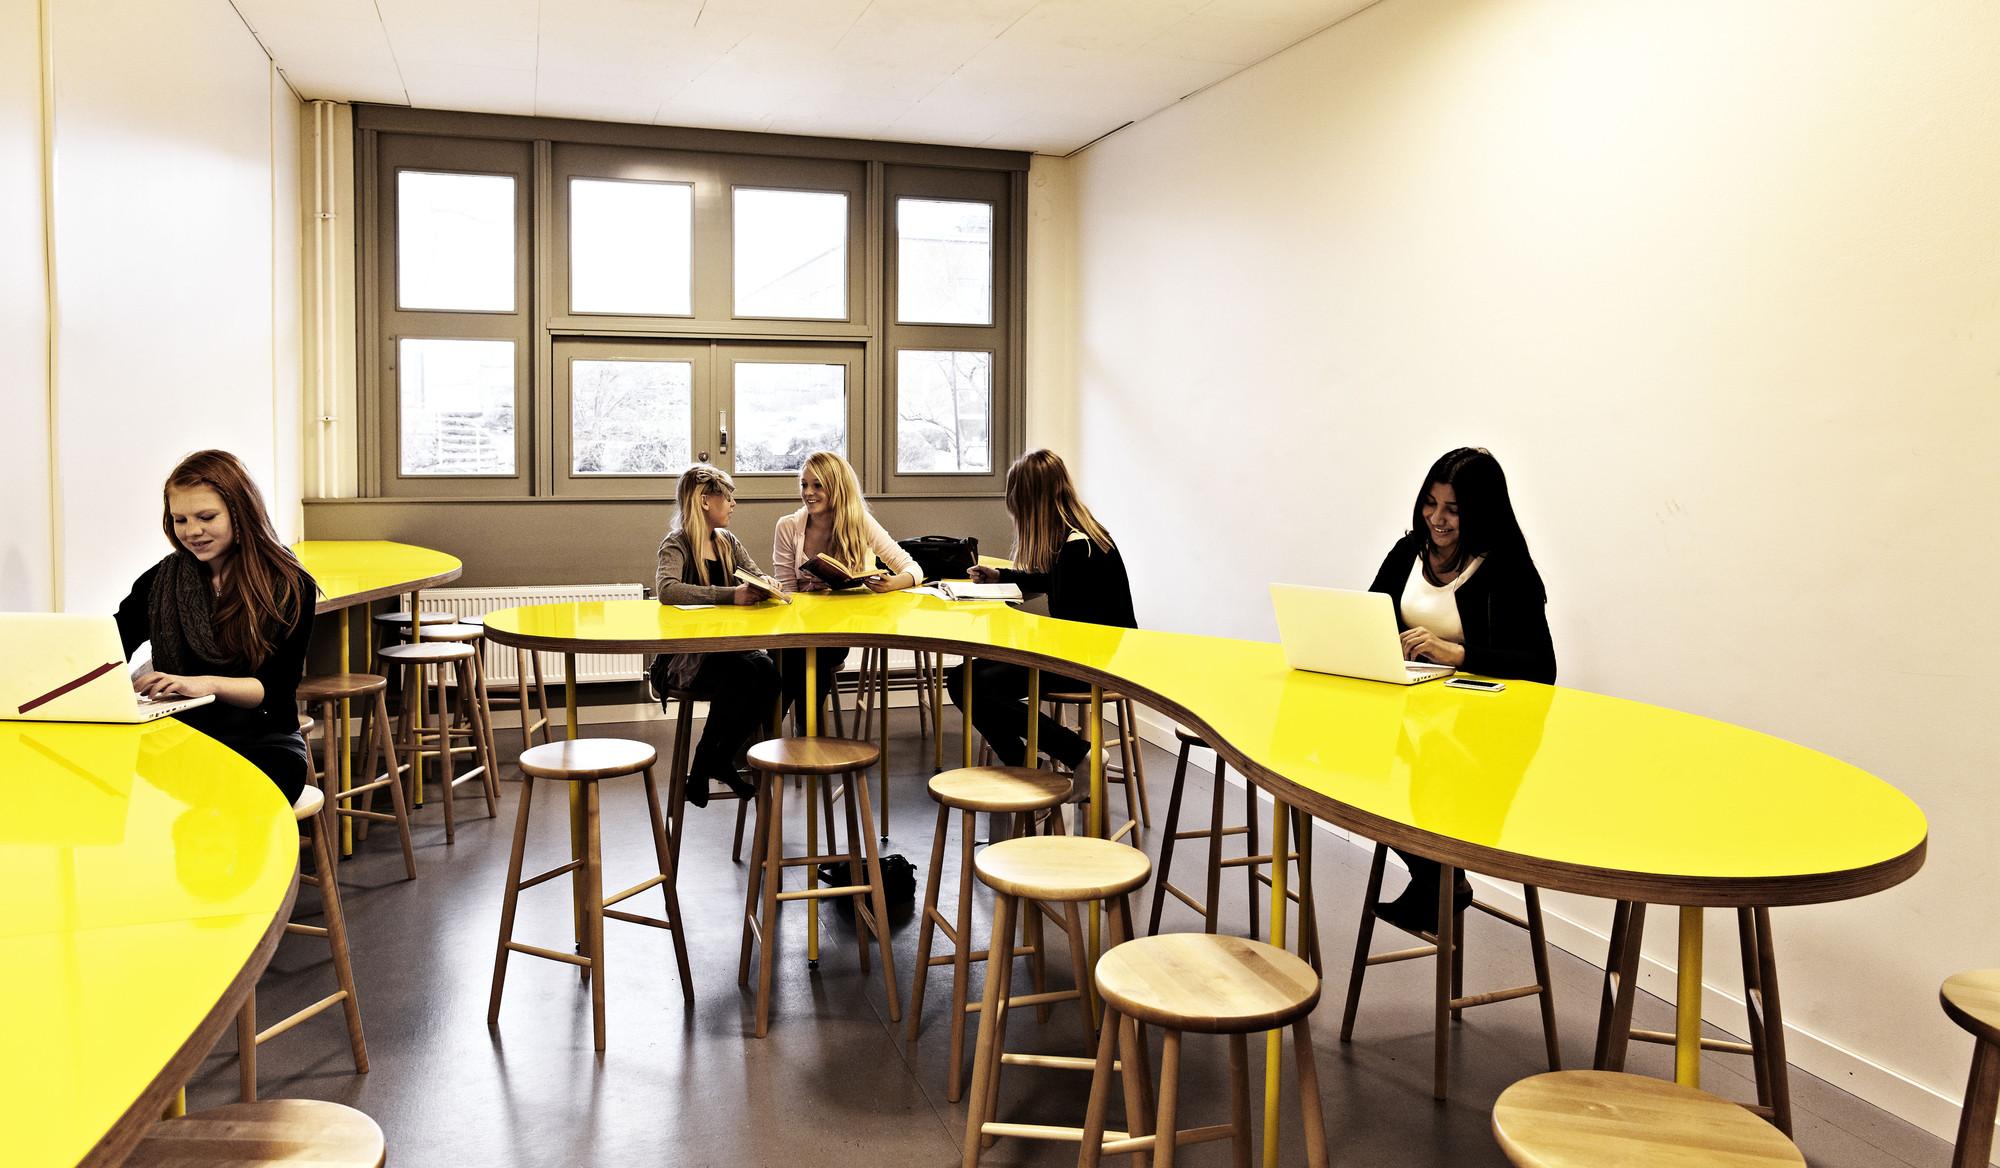 Stockholm Design School